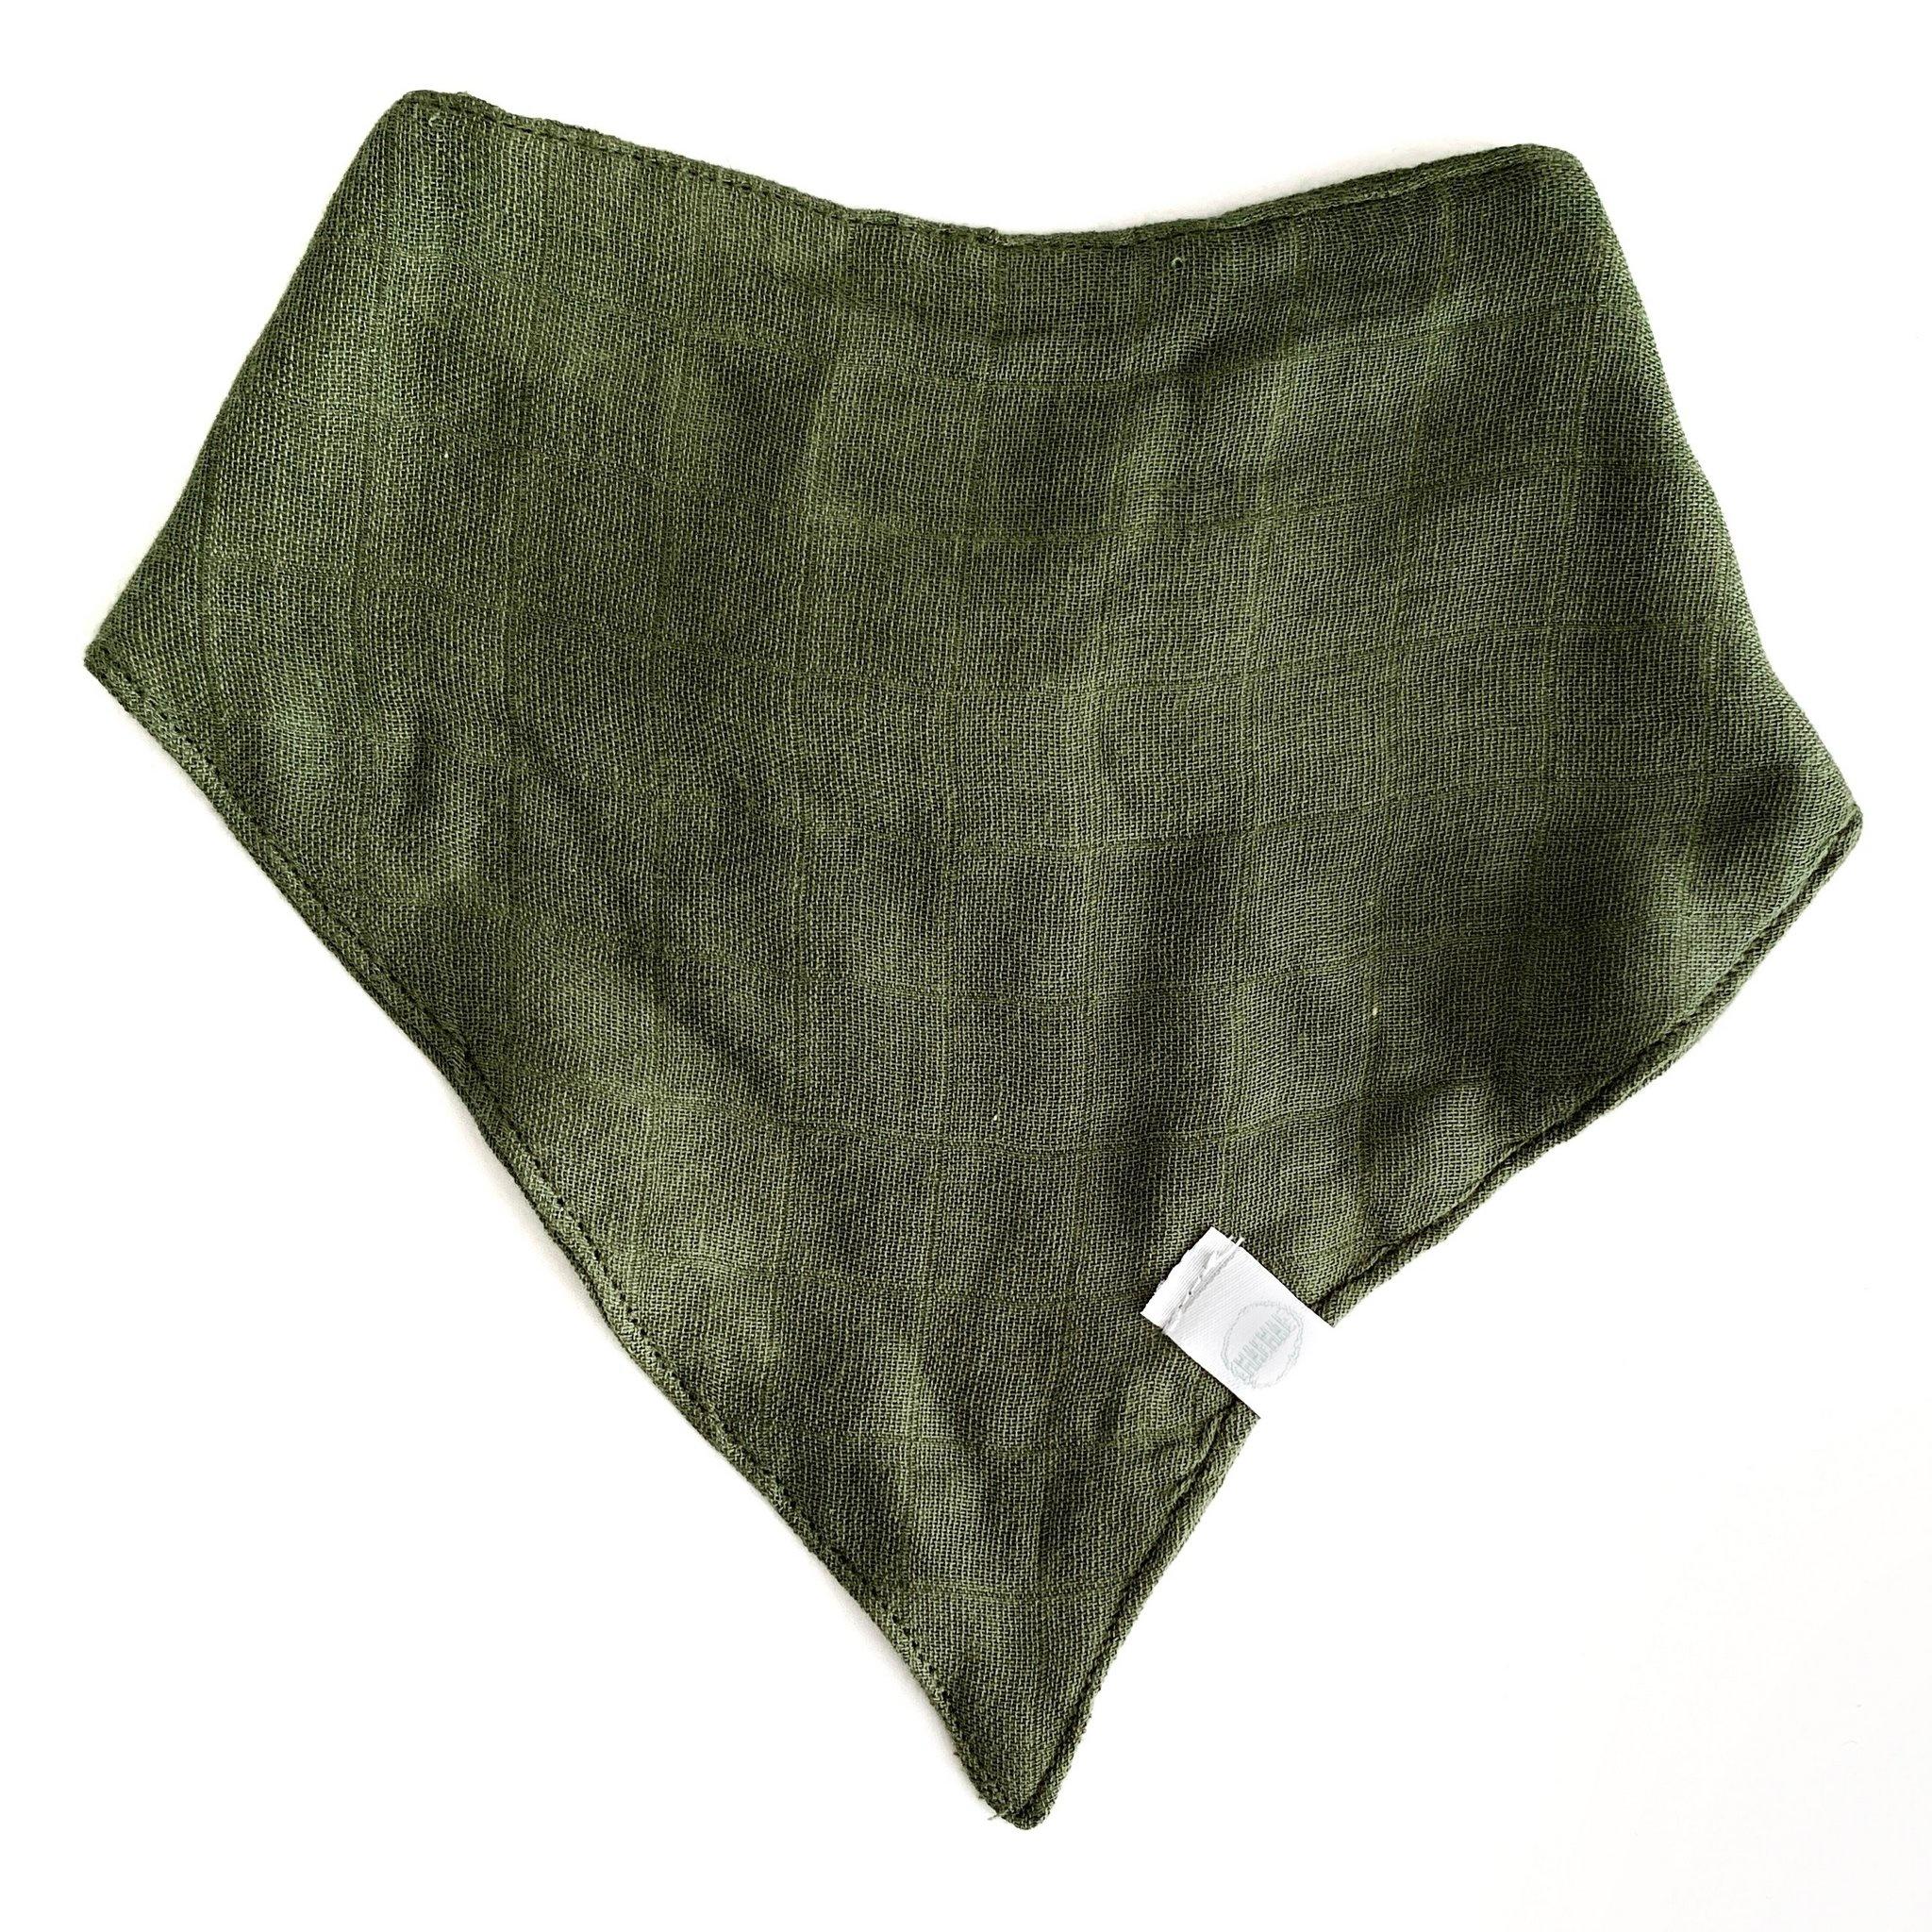 Kwijlslabbetje - Moss Green-2